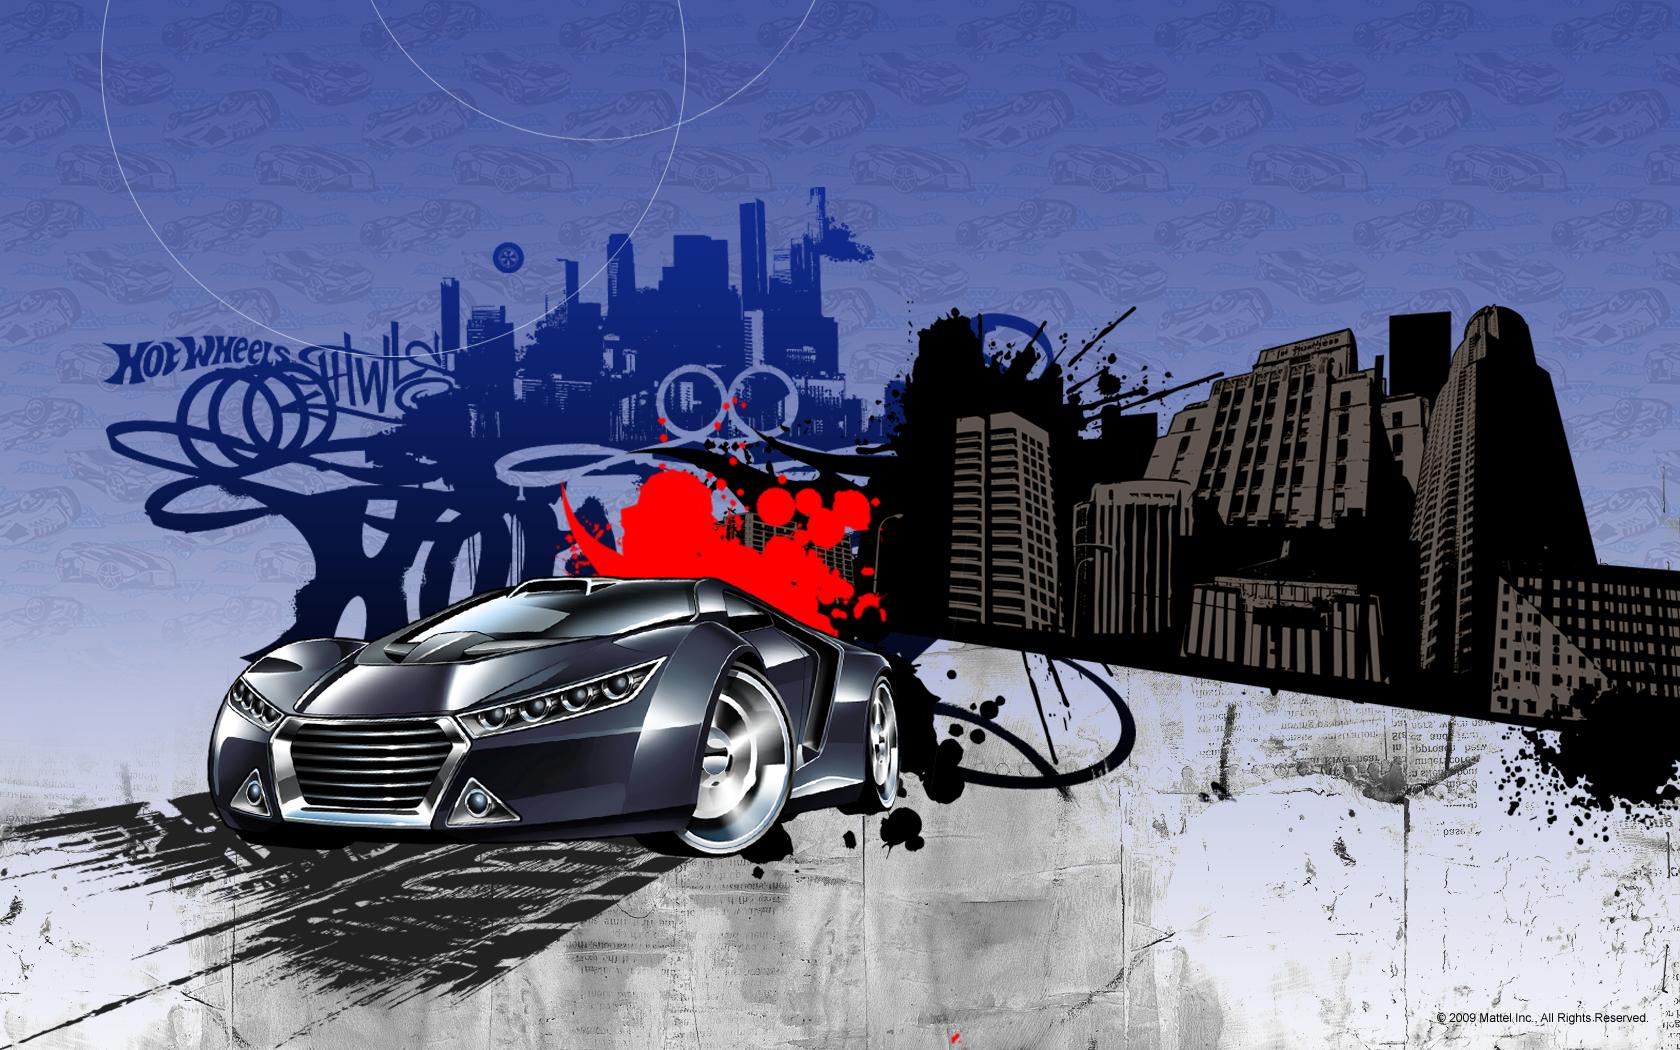 Beautiful Wallpaper Logo Hot Wheel - 1680x1050  Picture_45575.org/get/20321/1680x1050